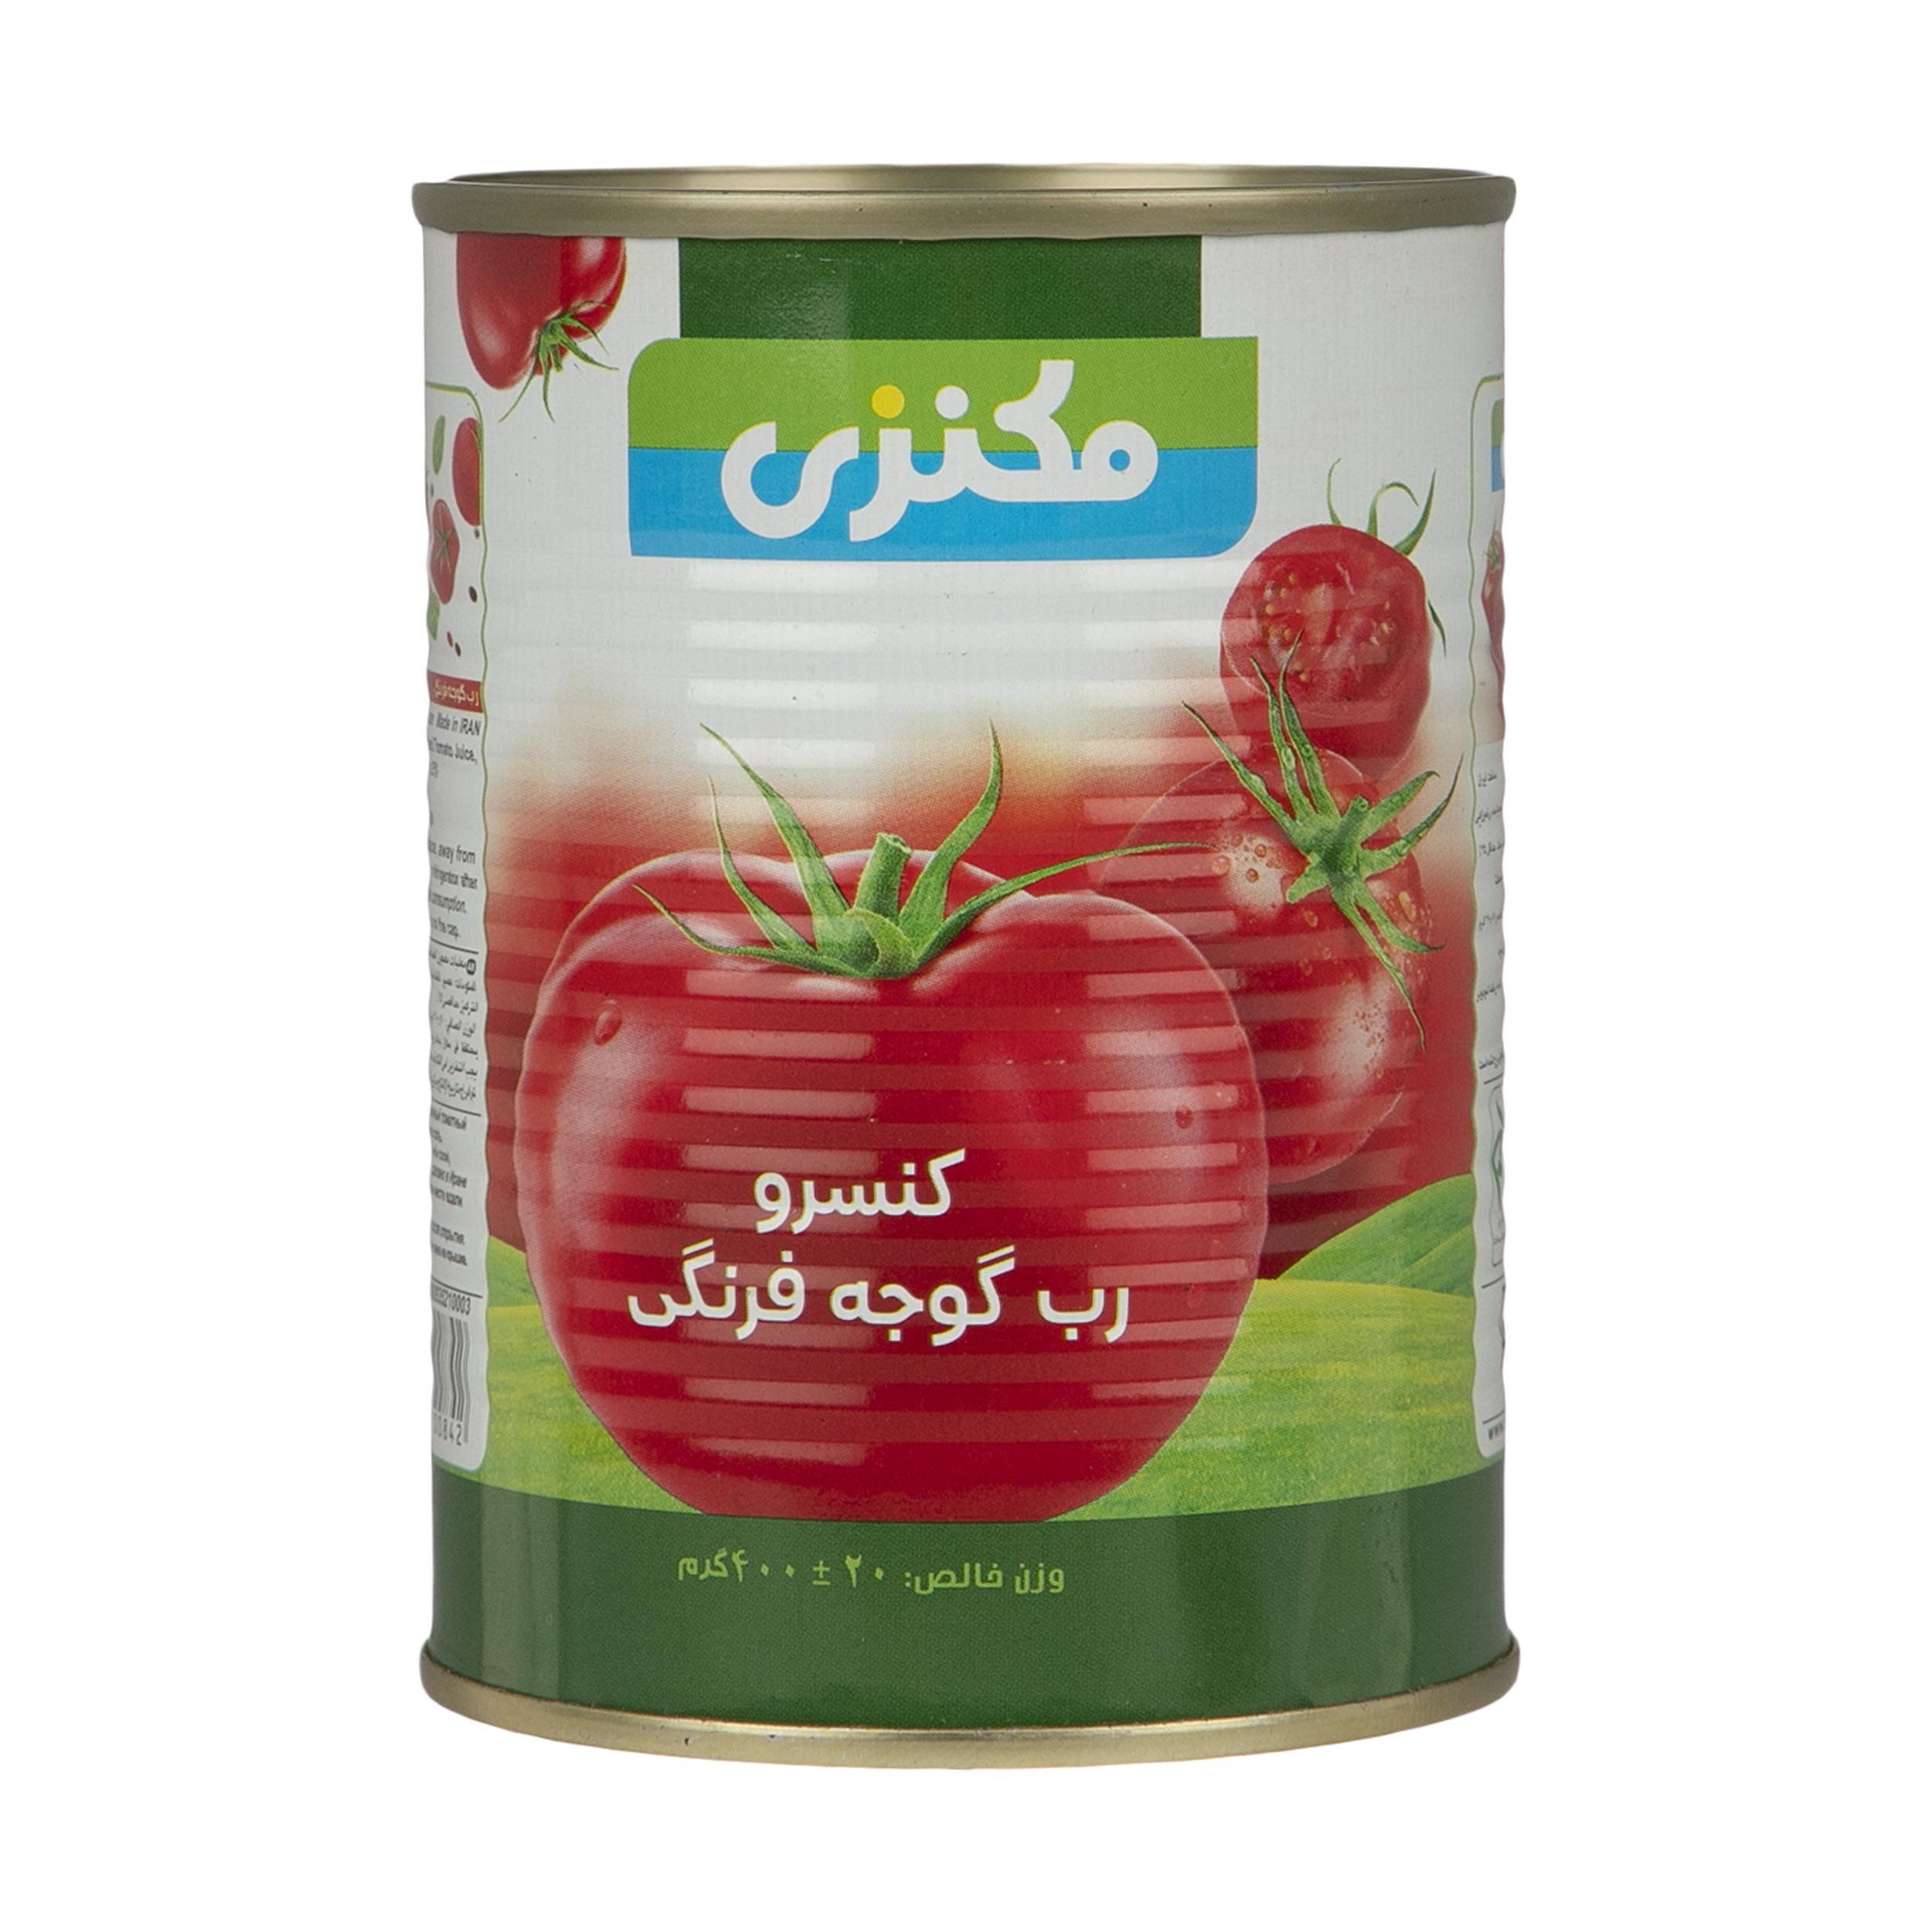 رب گوجه فرنگی مکنزی - 400 گرم